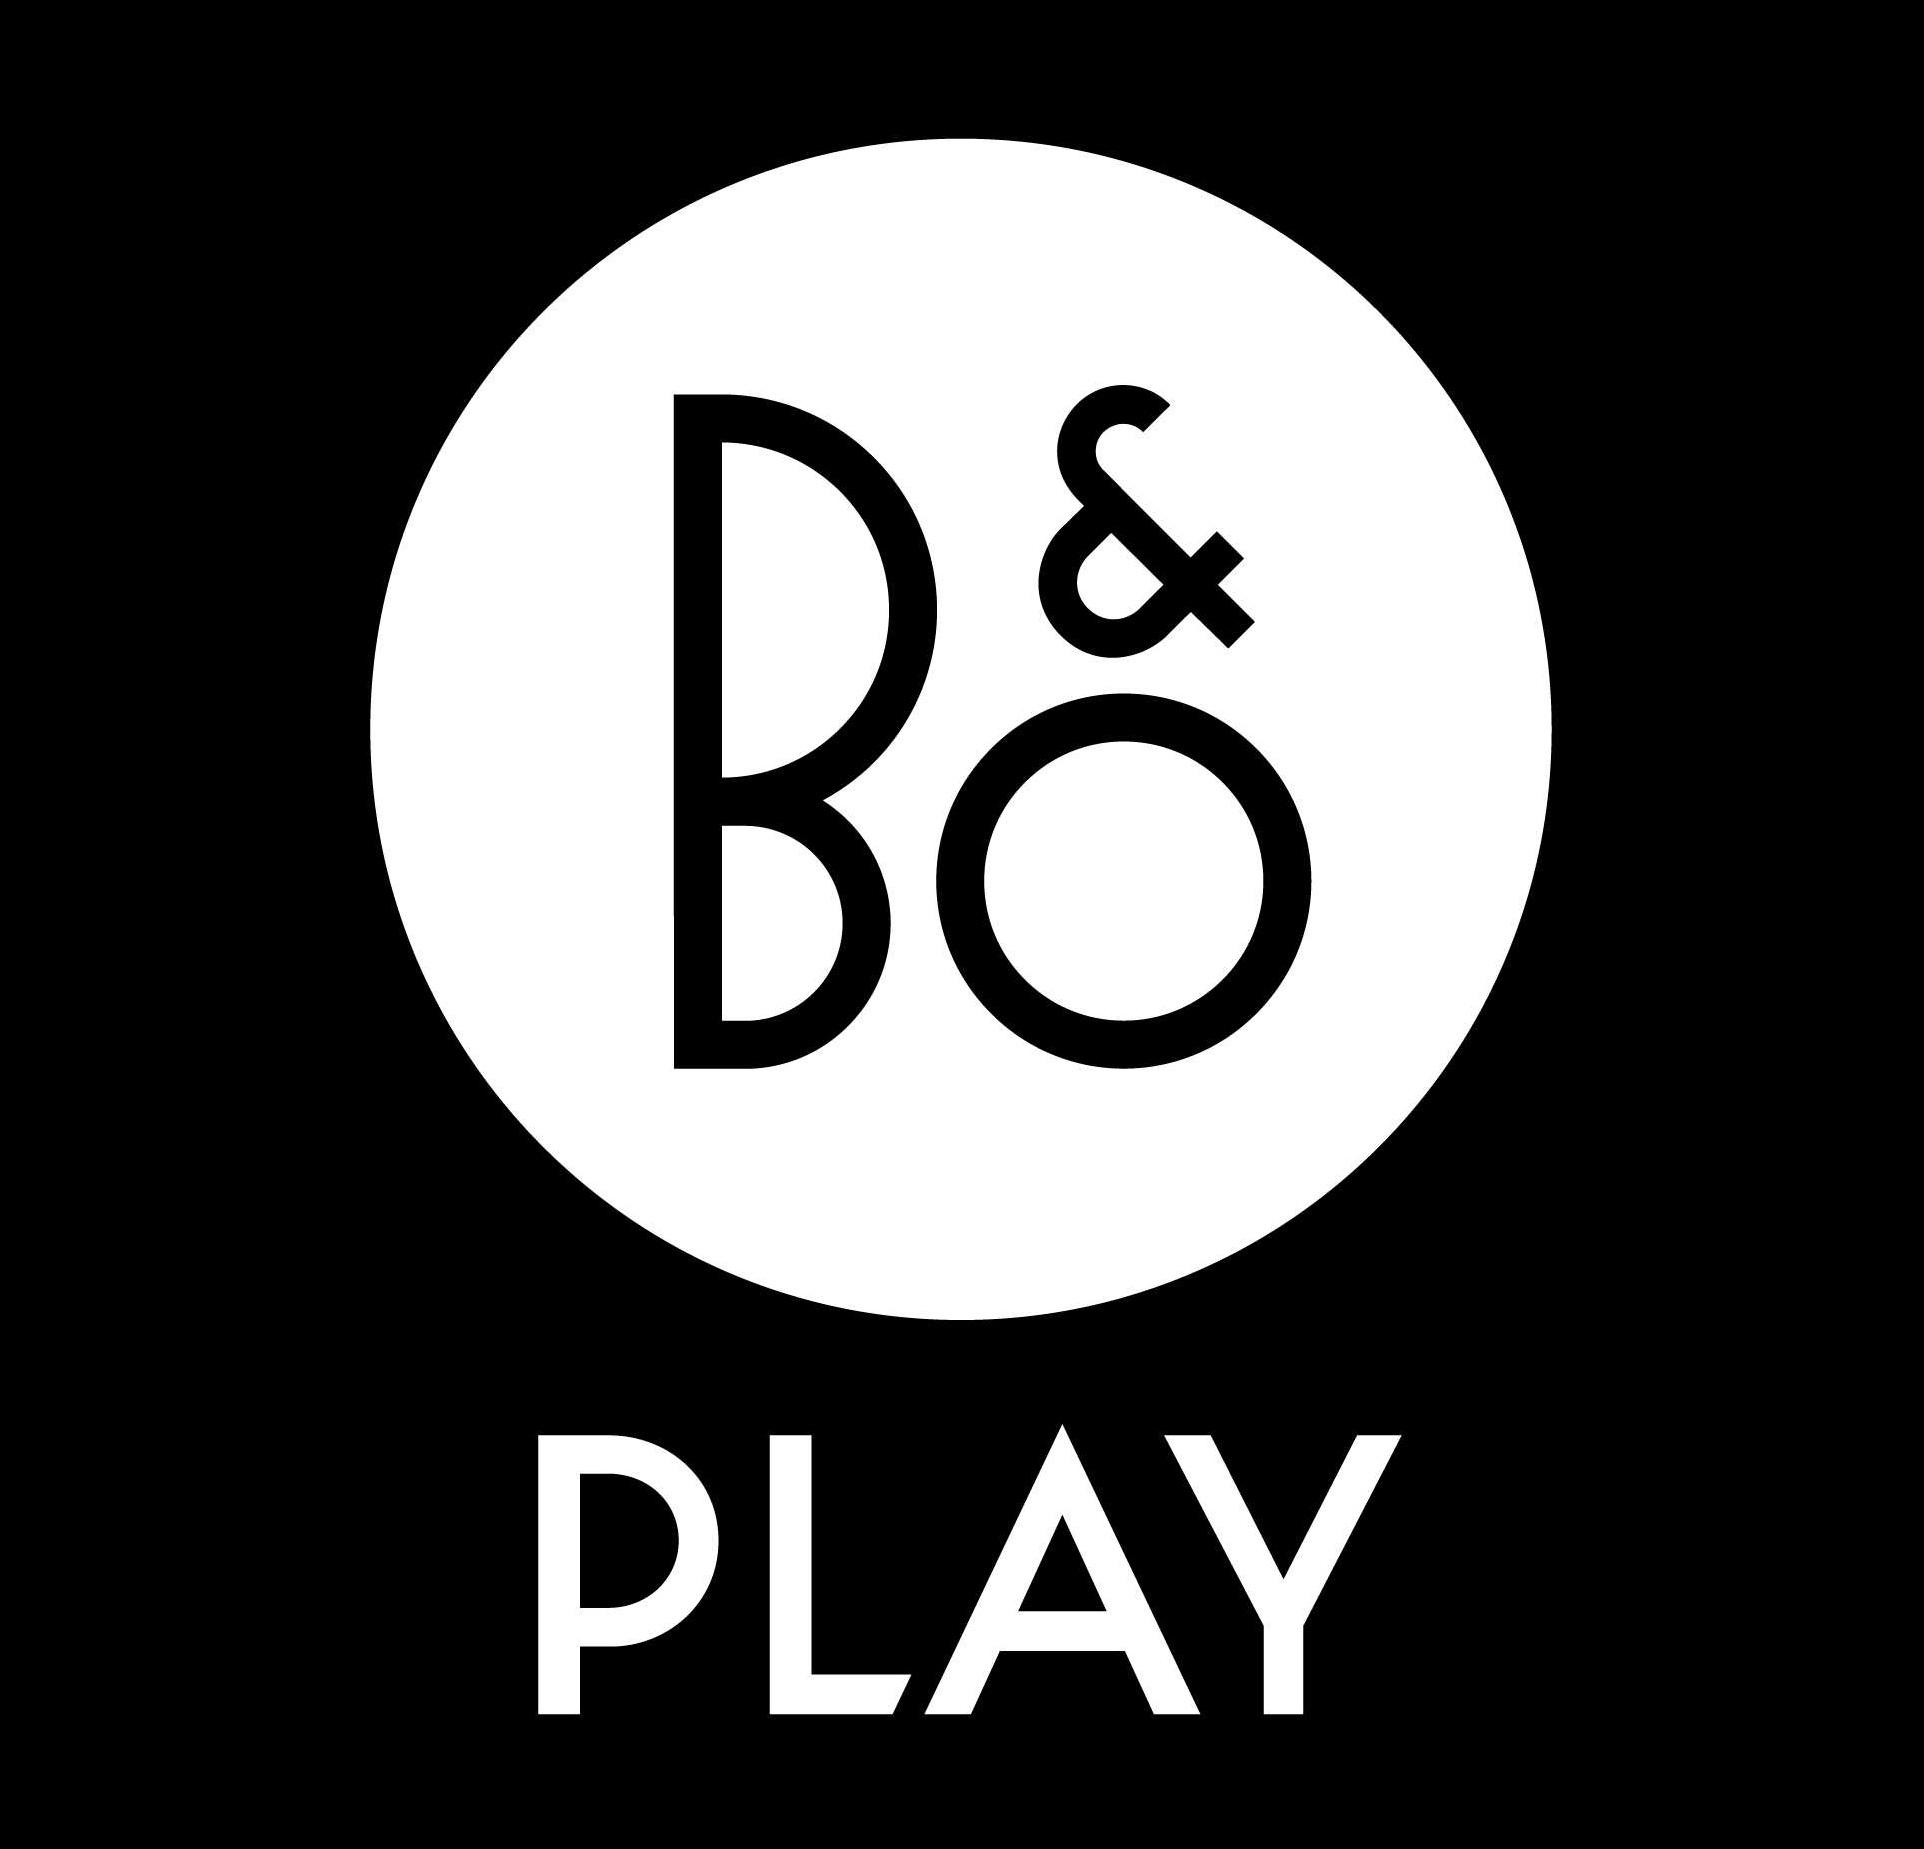 Beoplay logo